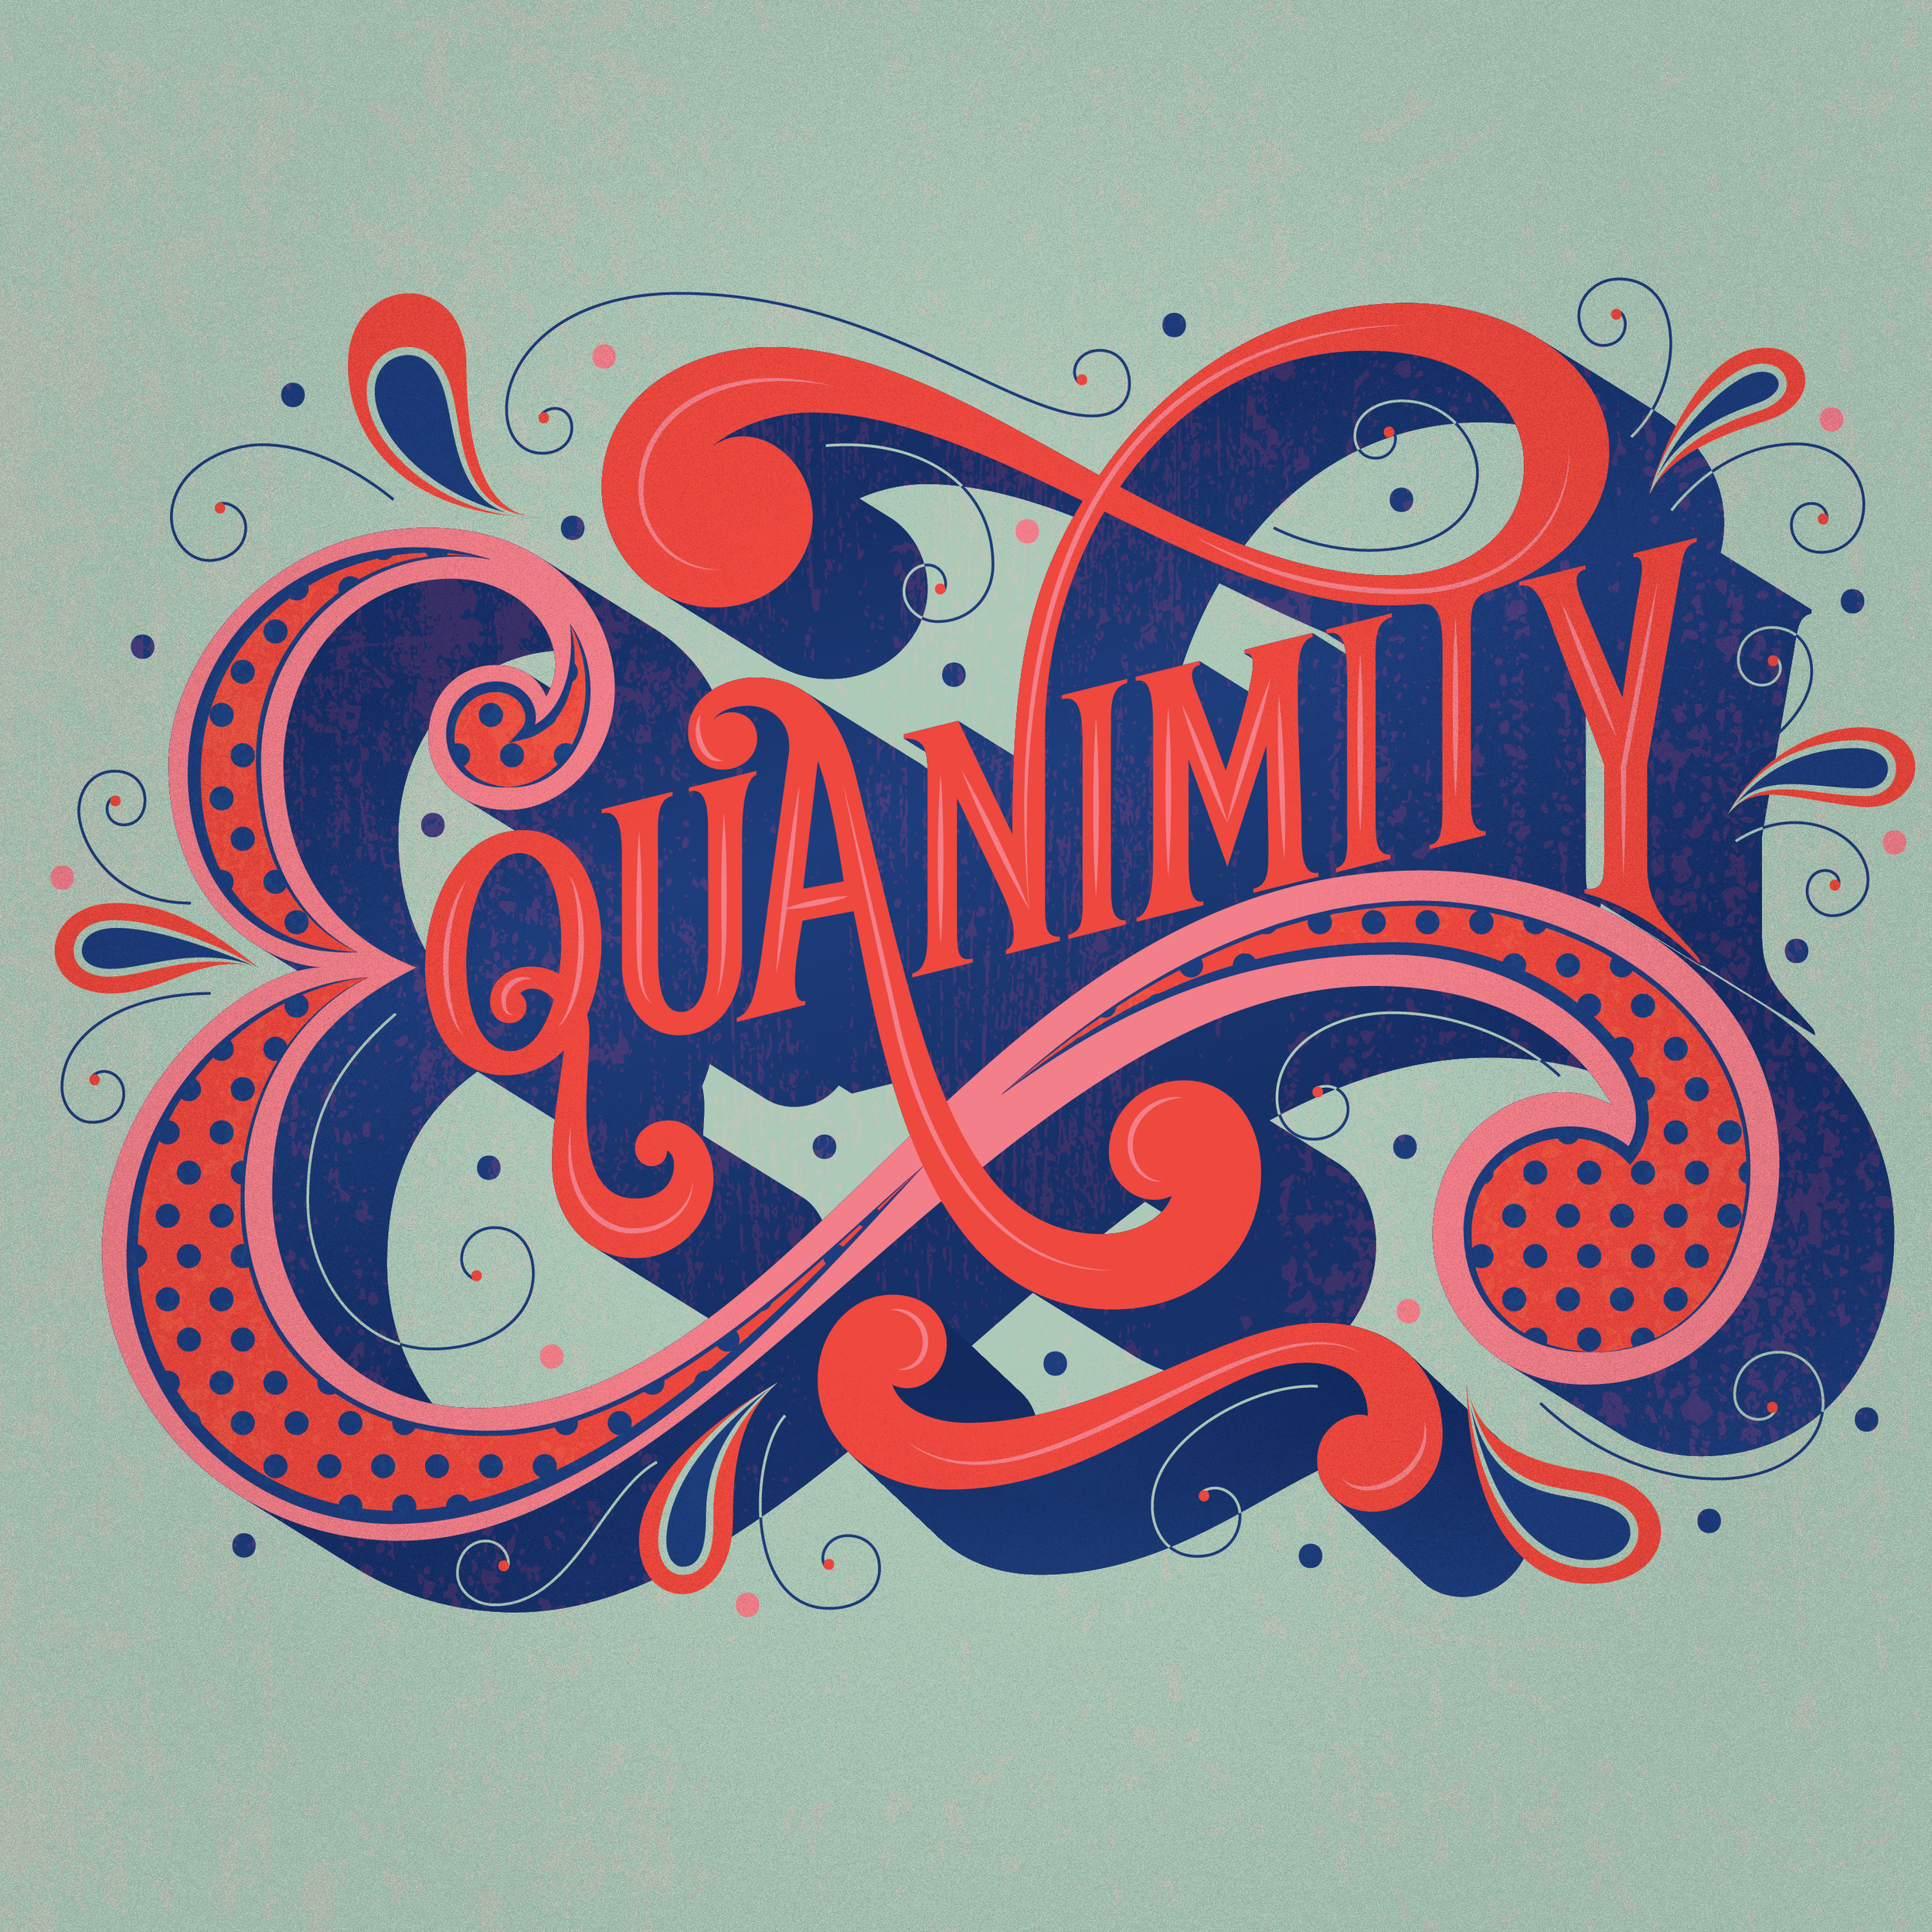 Equanimity_INSTA-01.jpg